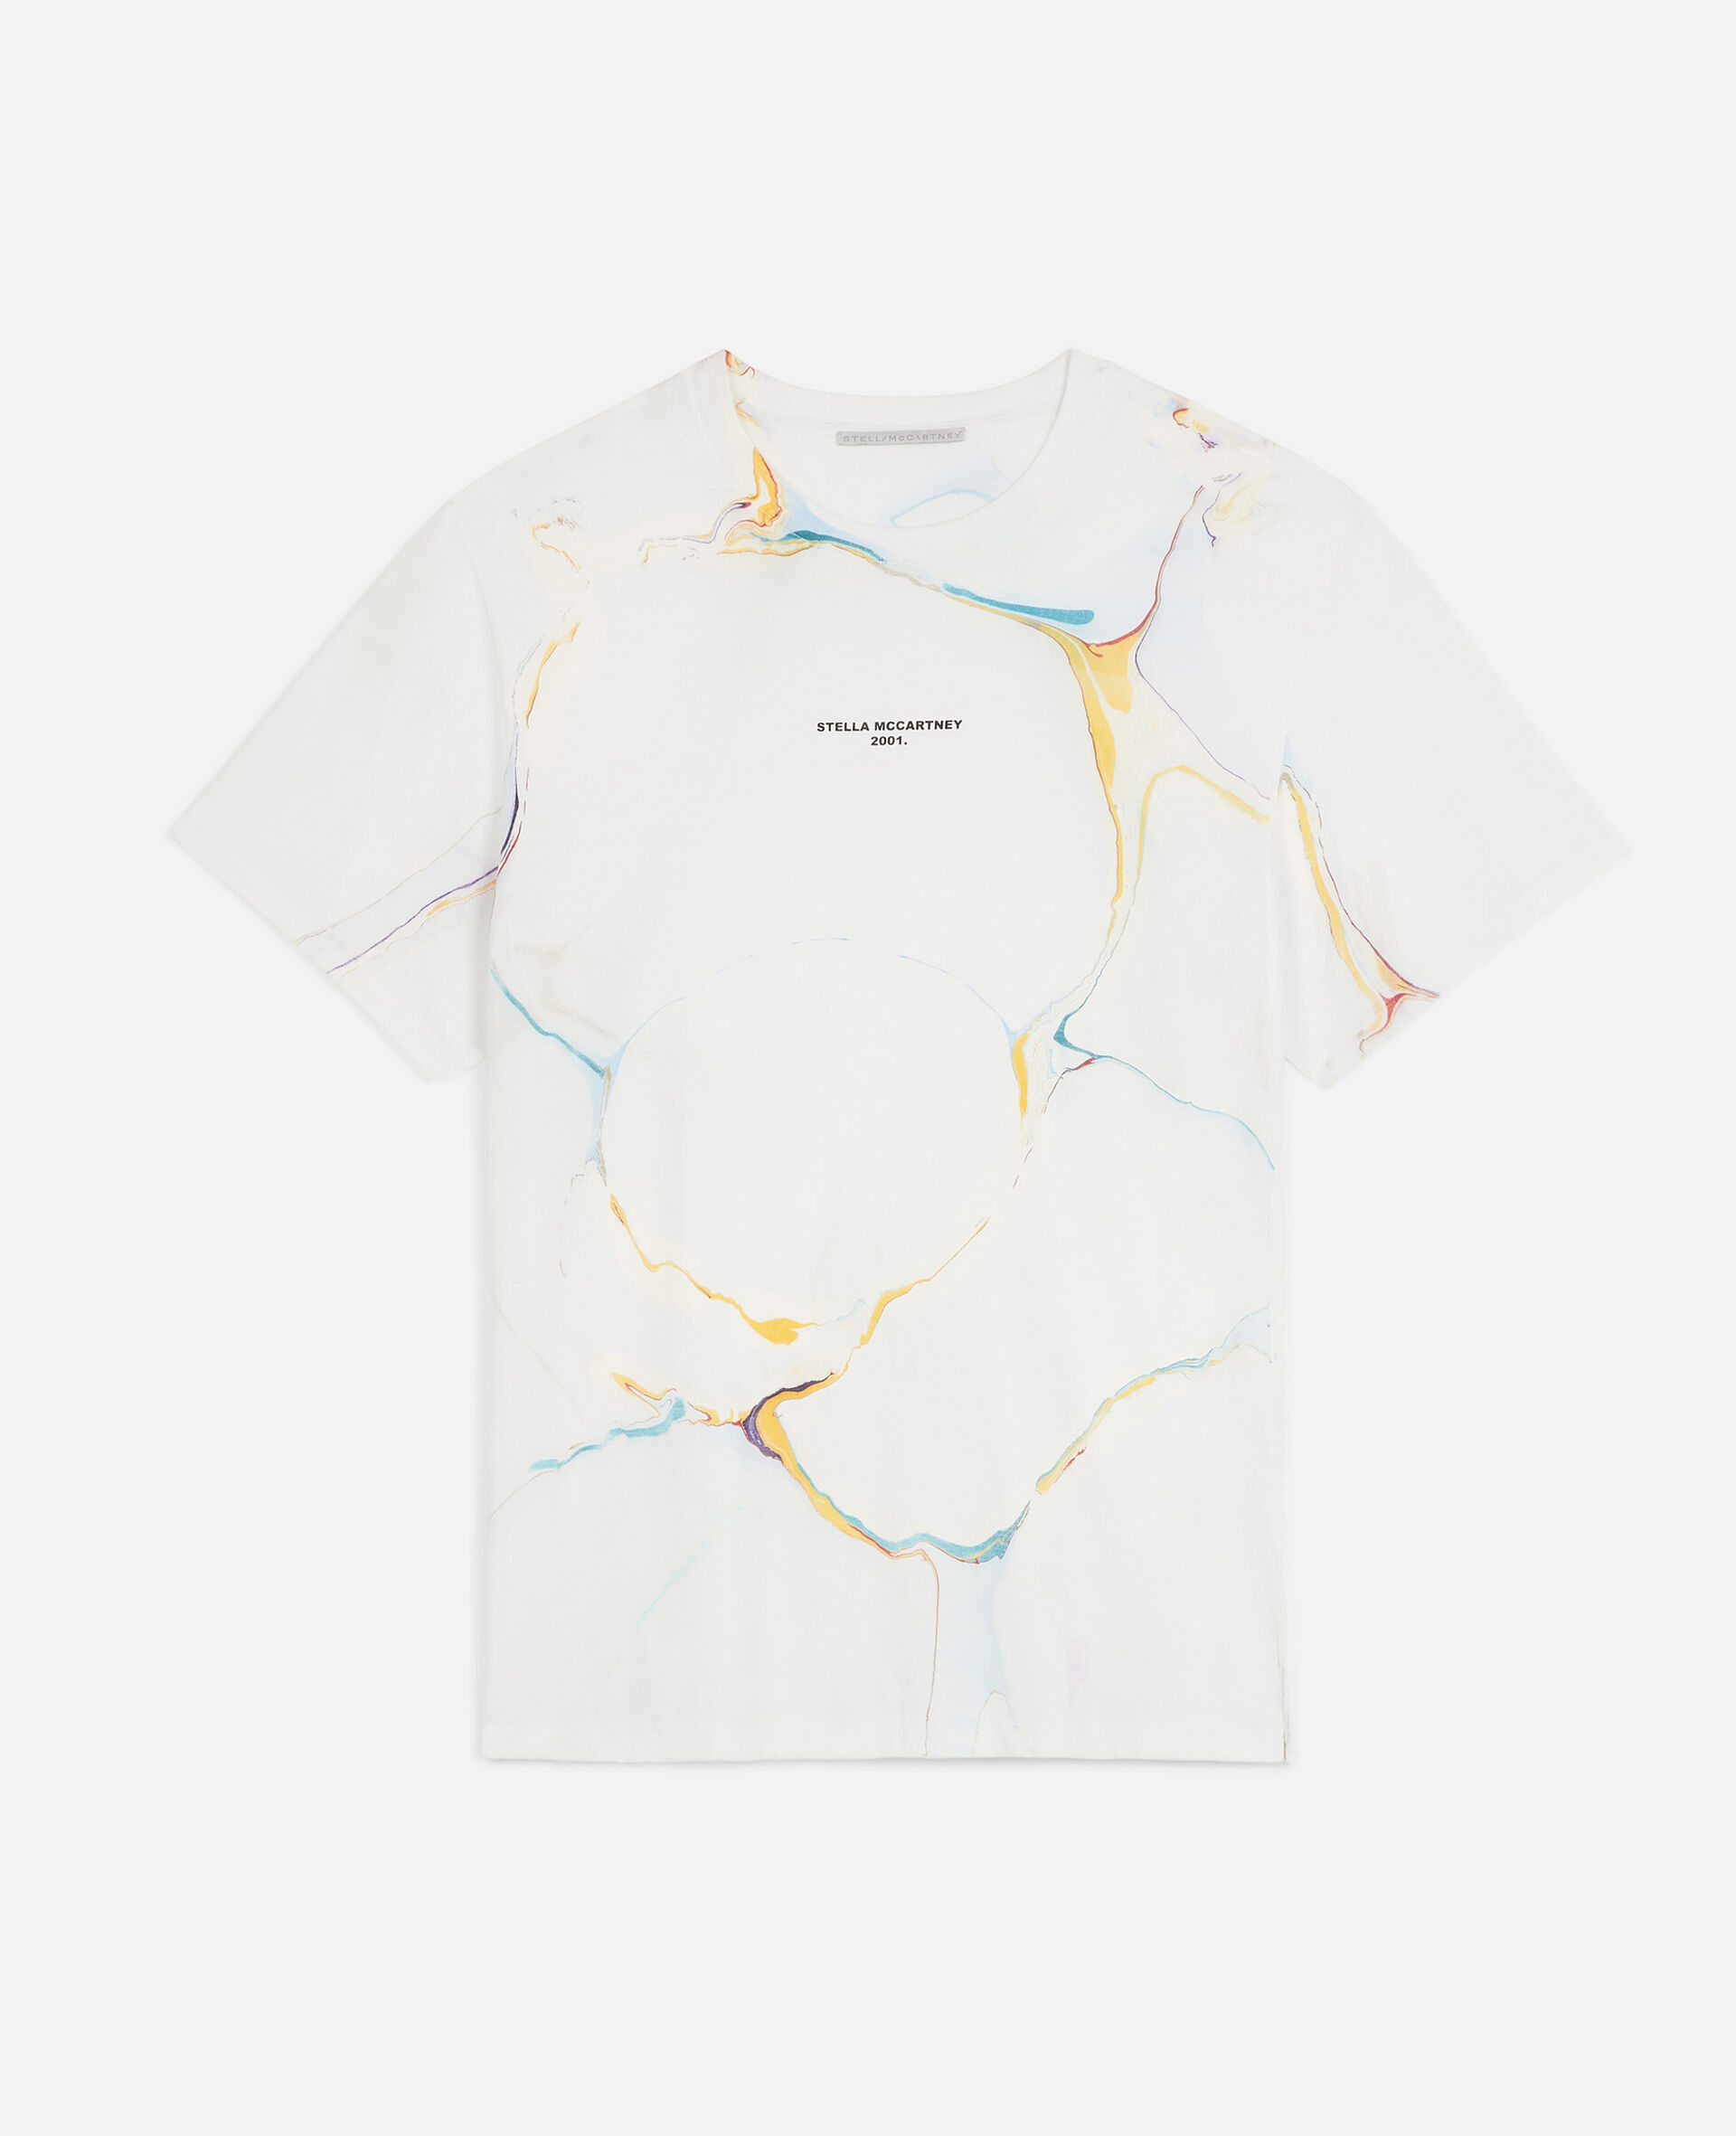 'Stella McCartney 2001.' T-shirt-White-large image number 0